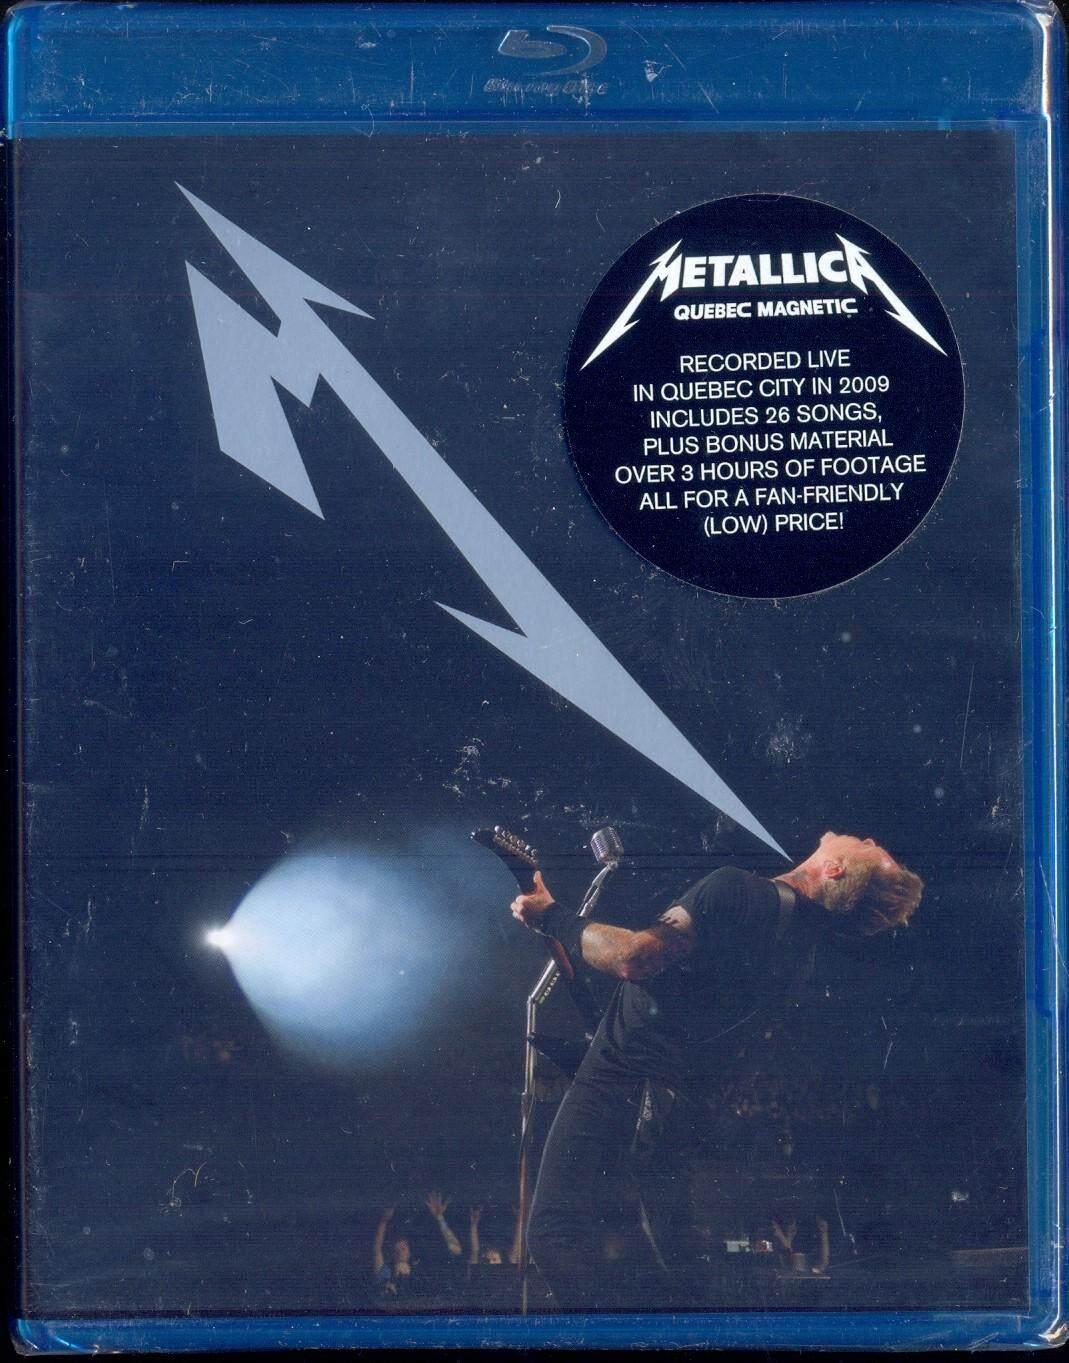 Metallica - Quebec Magnetic [ Blu-Ray ]